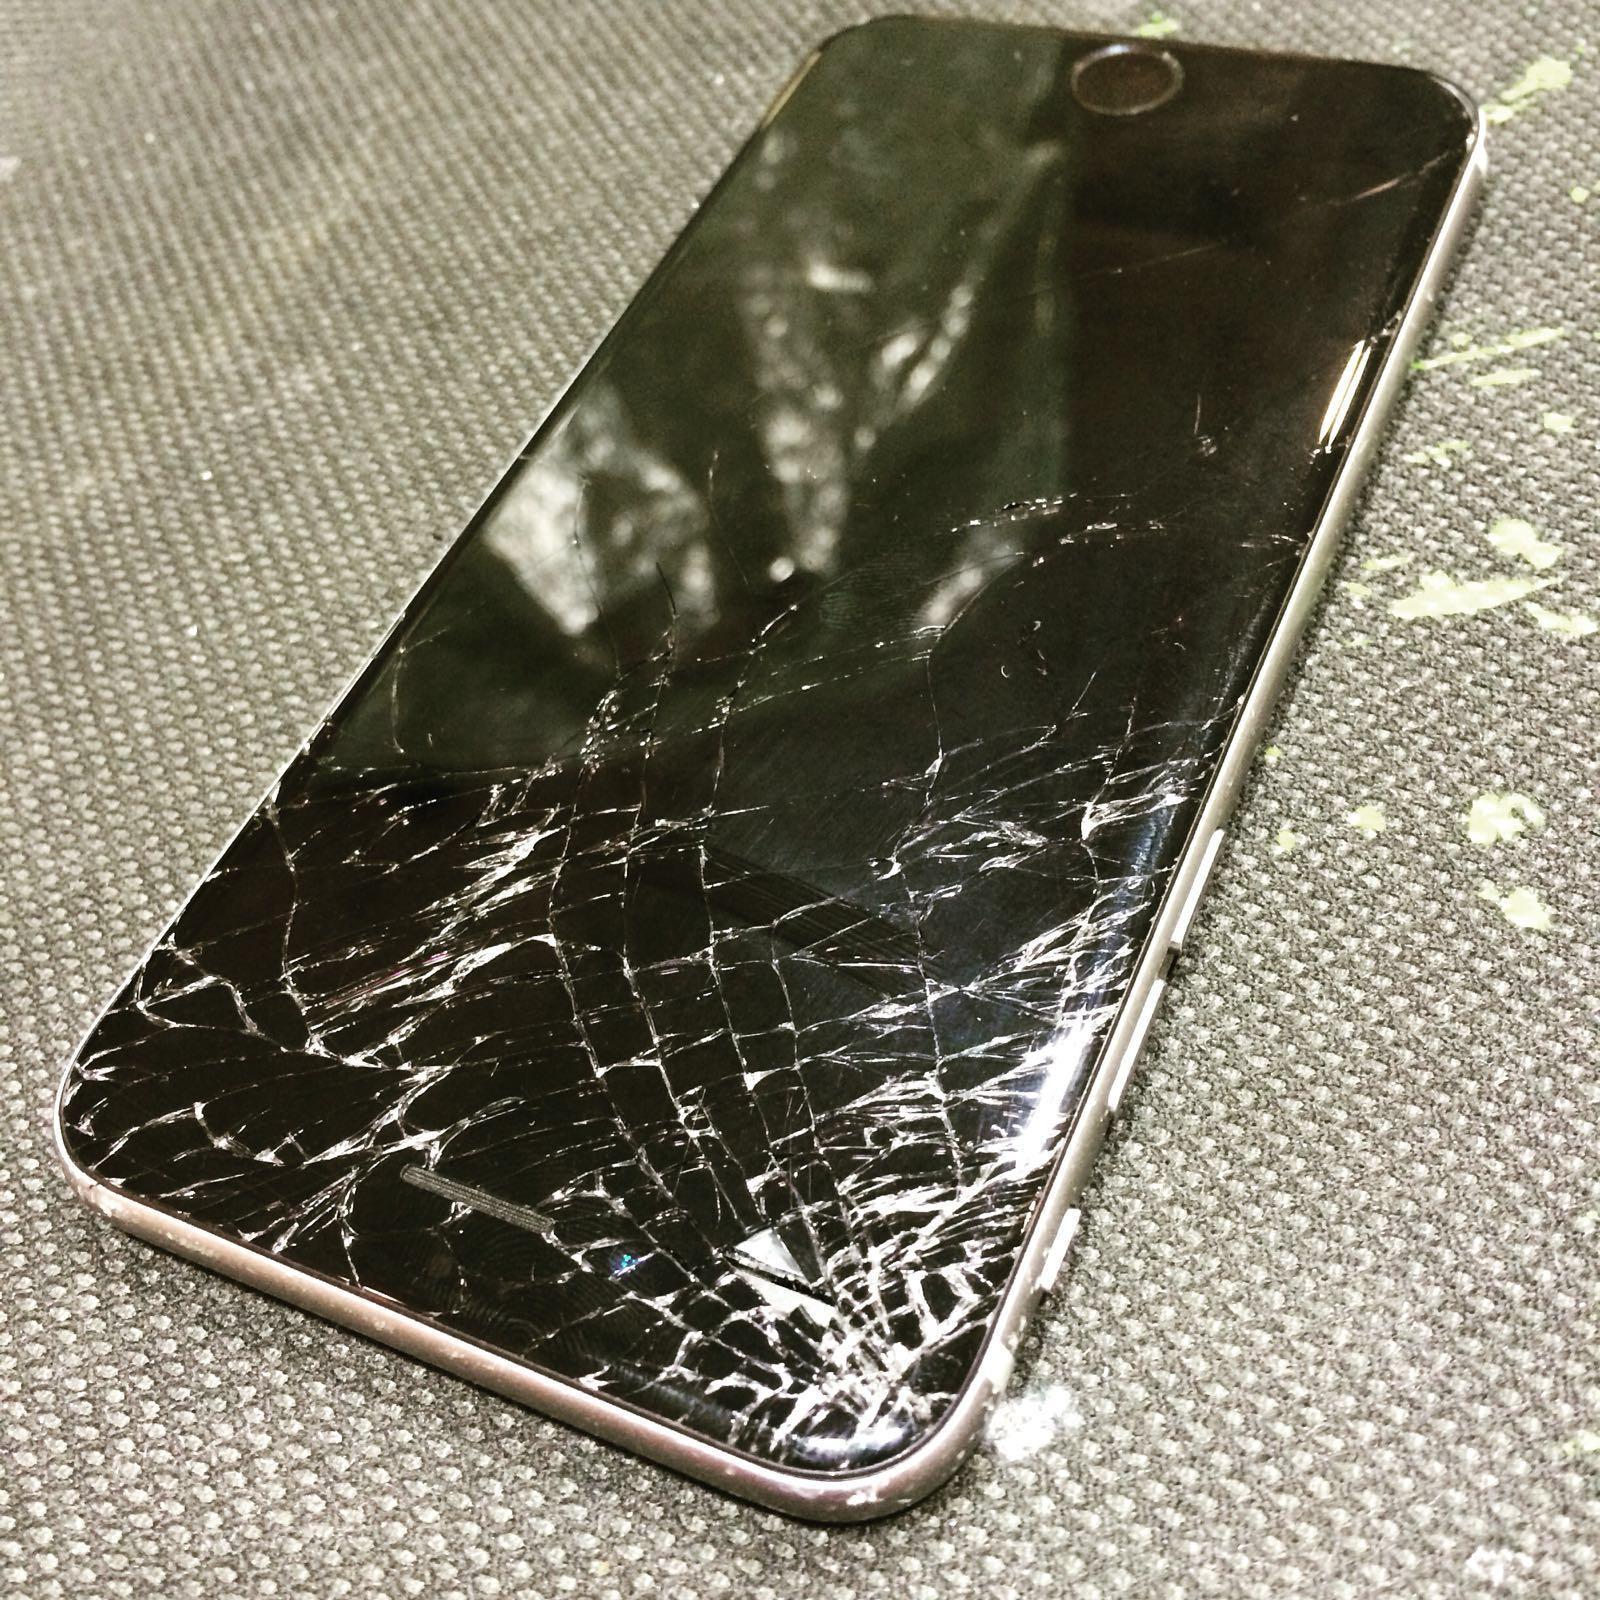 NOOO! my iPhone 5 is cracked